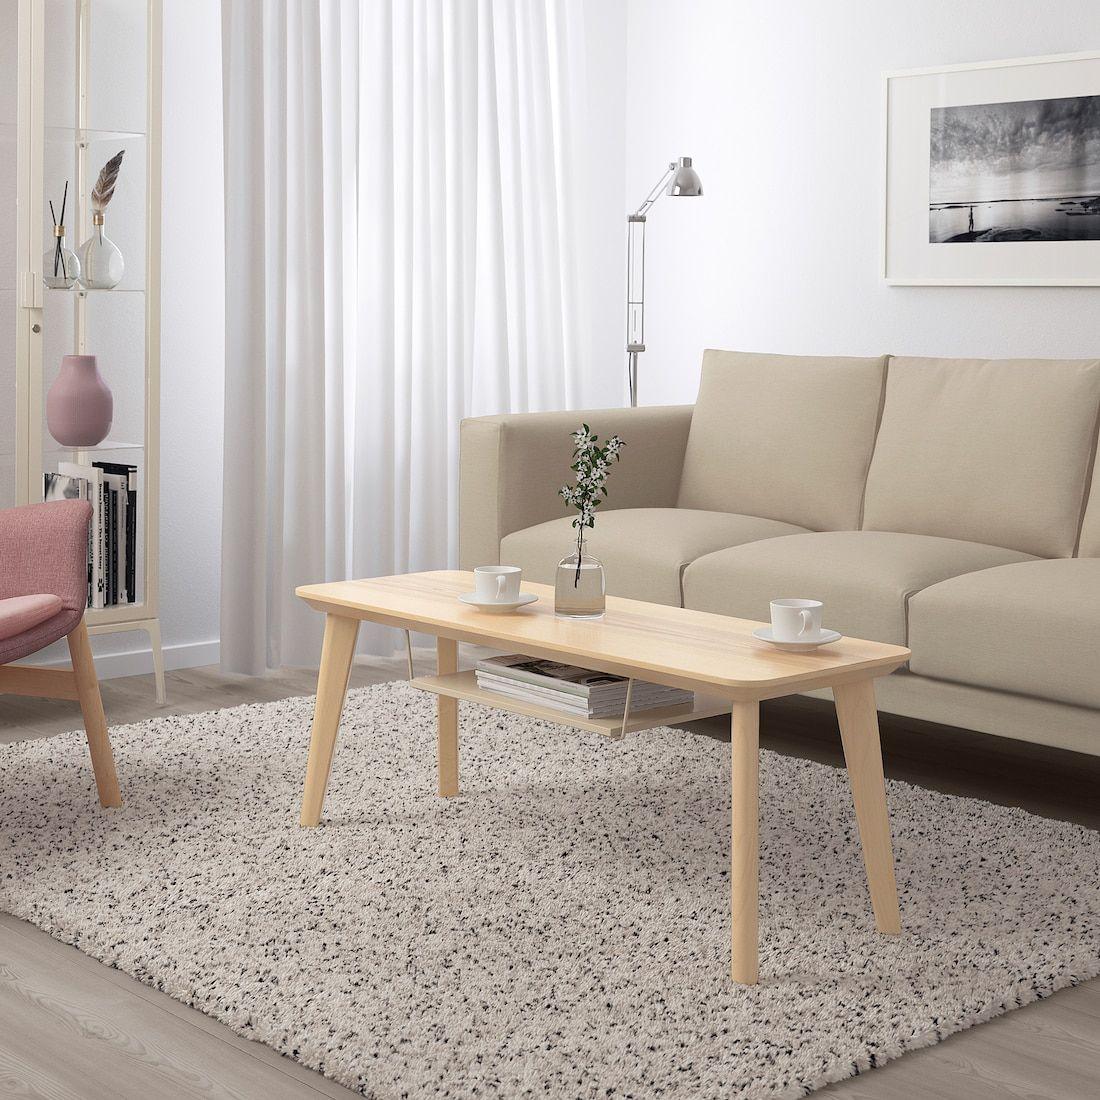 Ikea Us Furniture And Home Furnishings Tv Bench Ikea Home Furnishings [ 1100 x 1100 Pixel ]